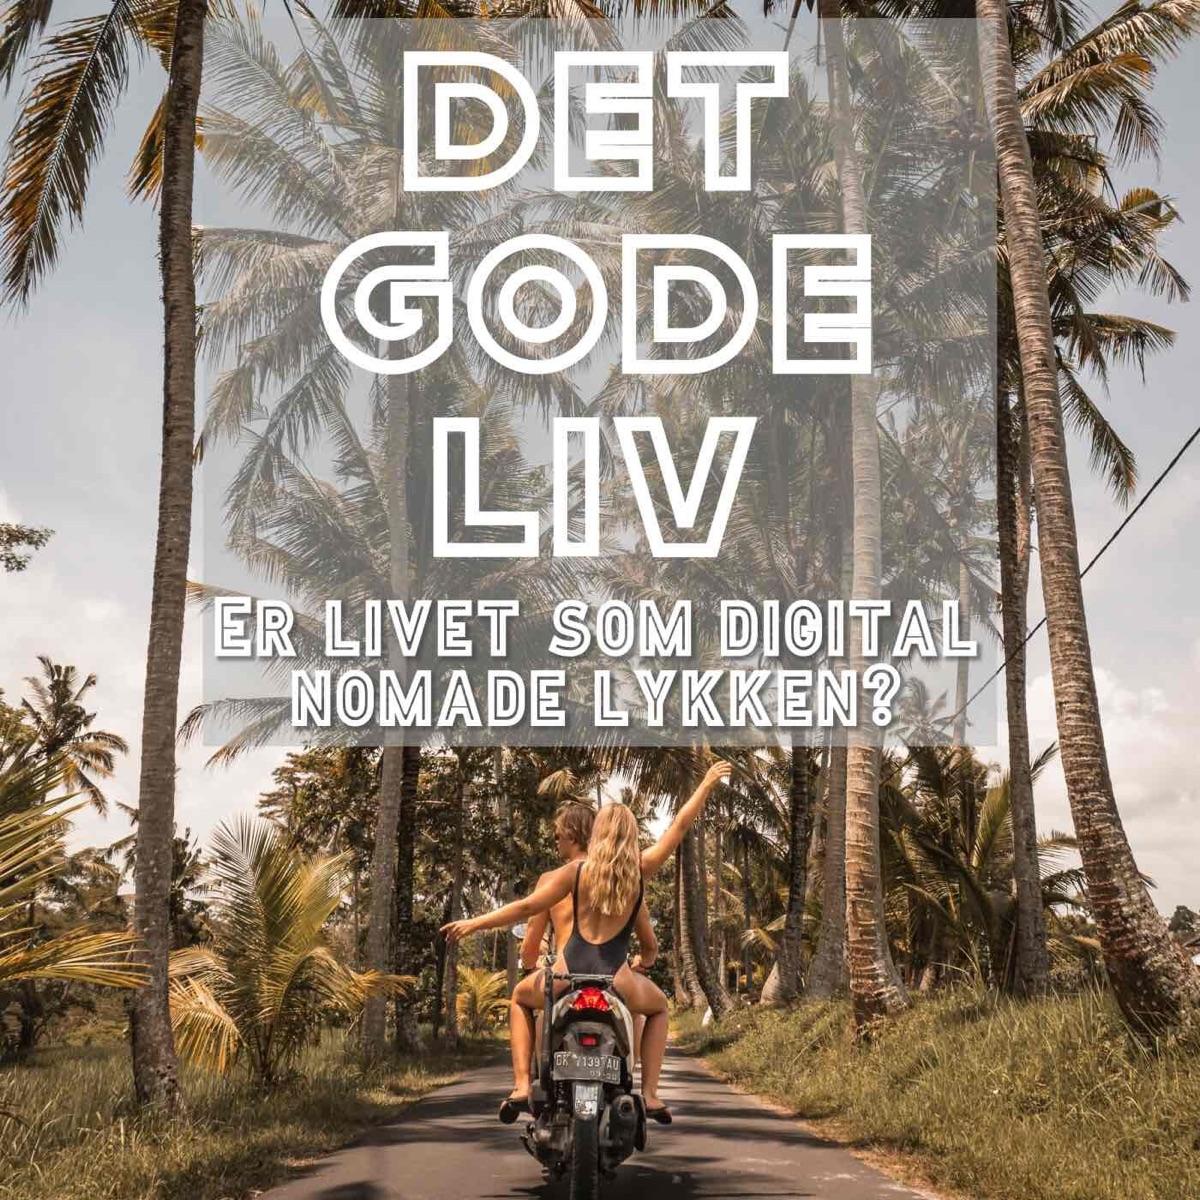 9: Mille Sjøgren: Man kan godt tjene mange penge som digital nomade